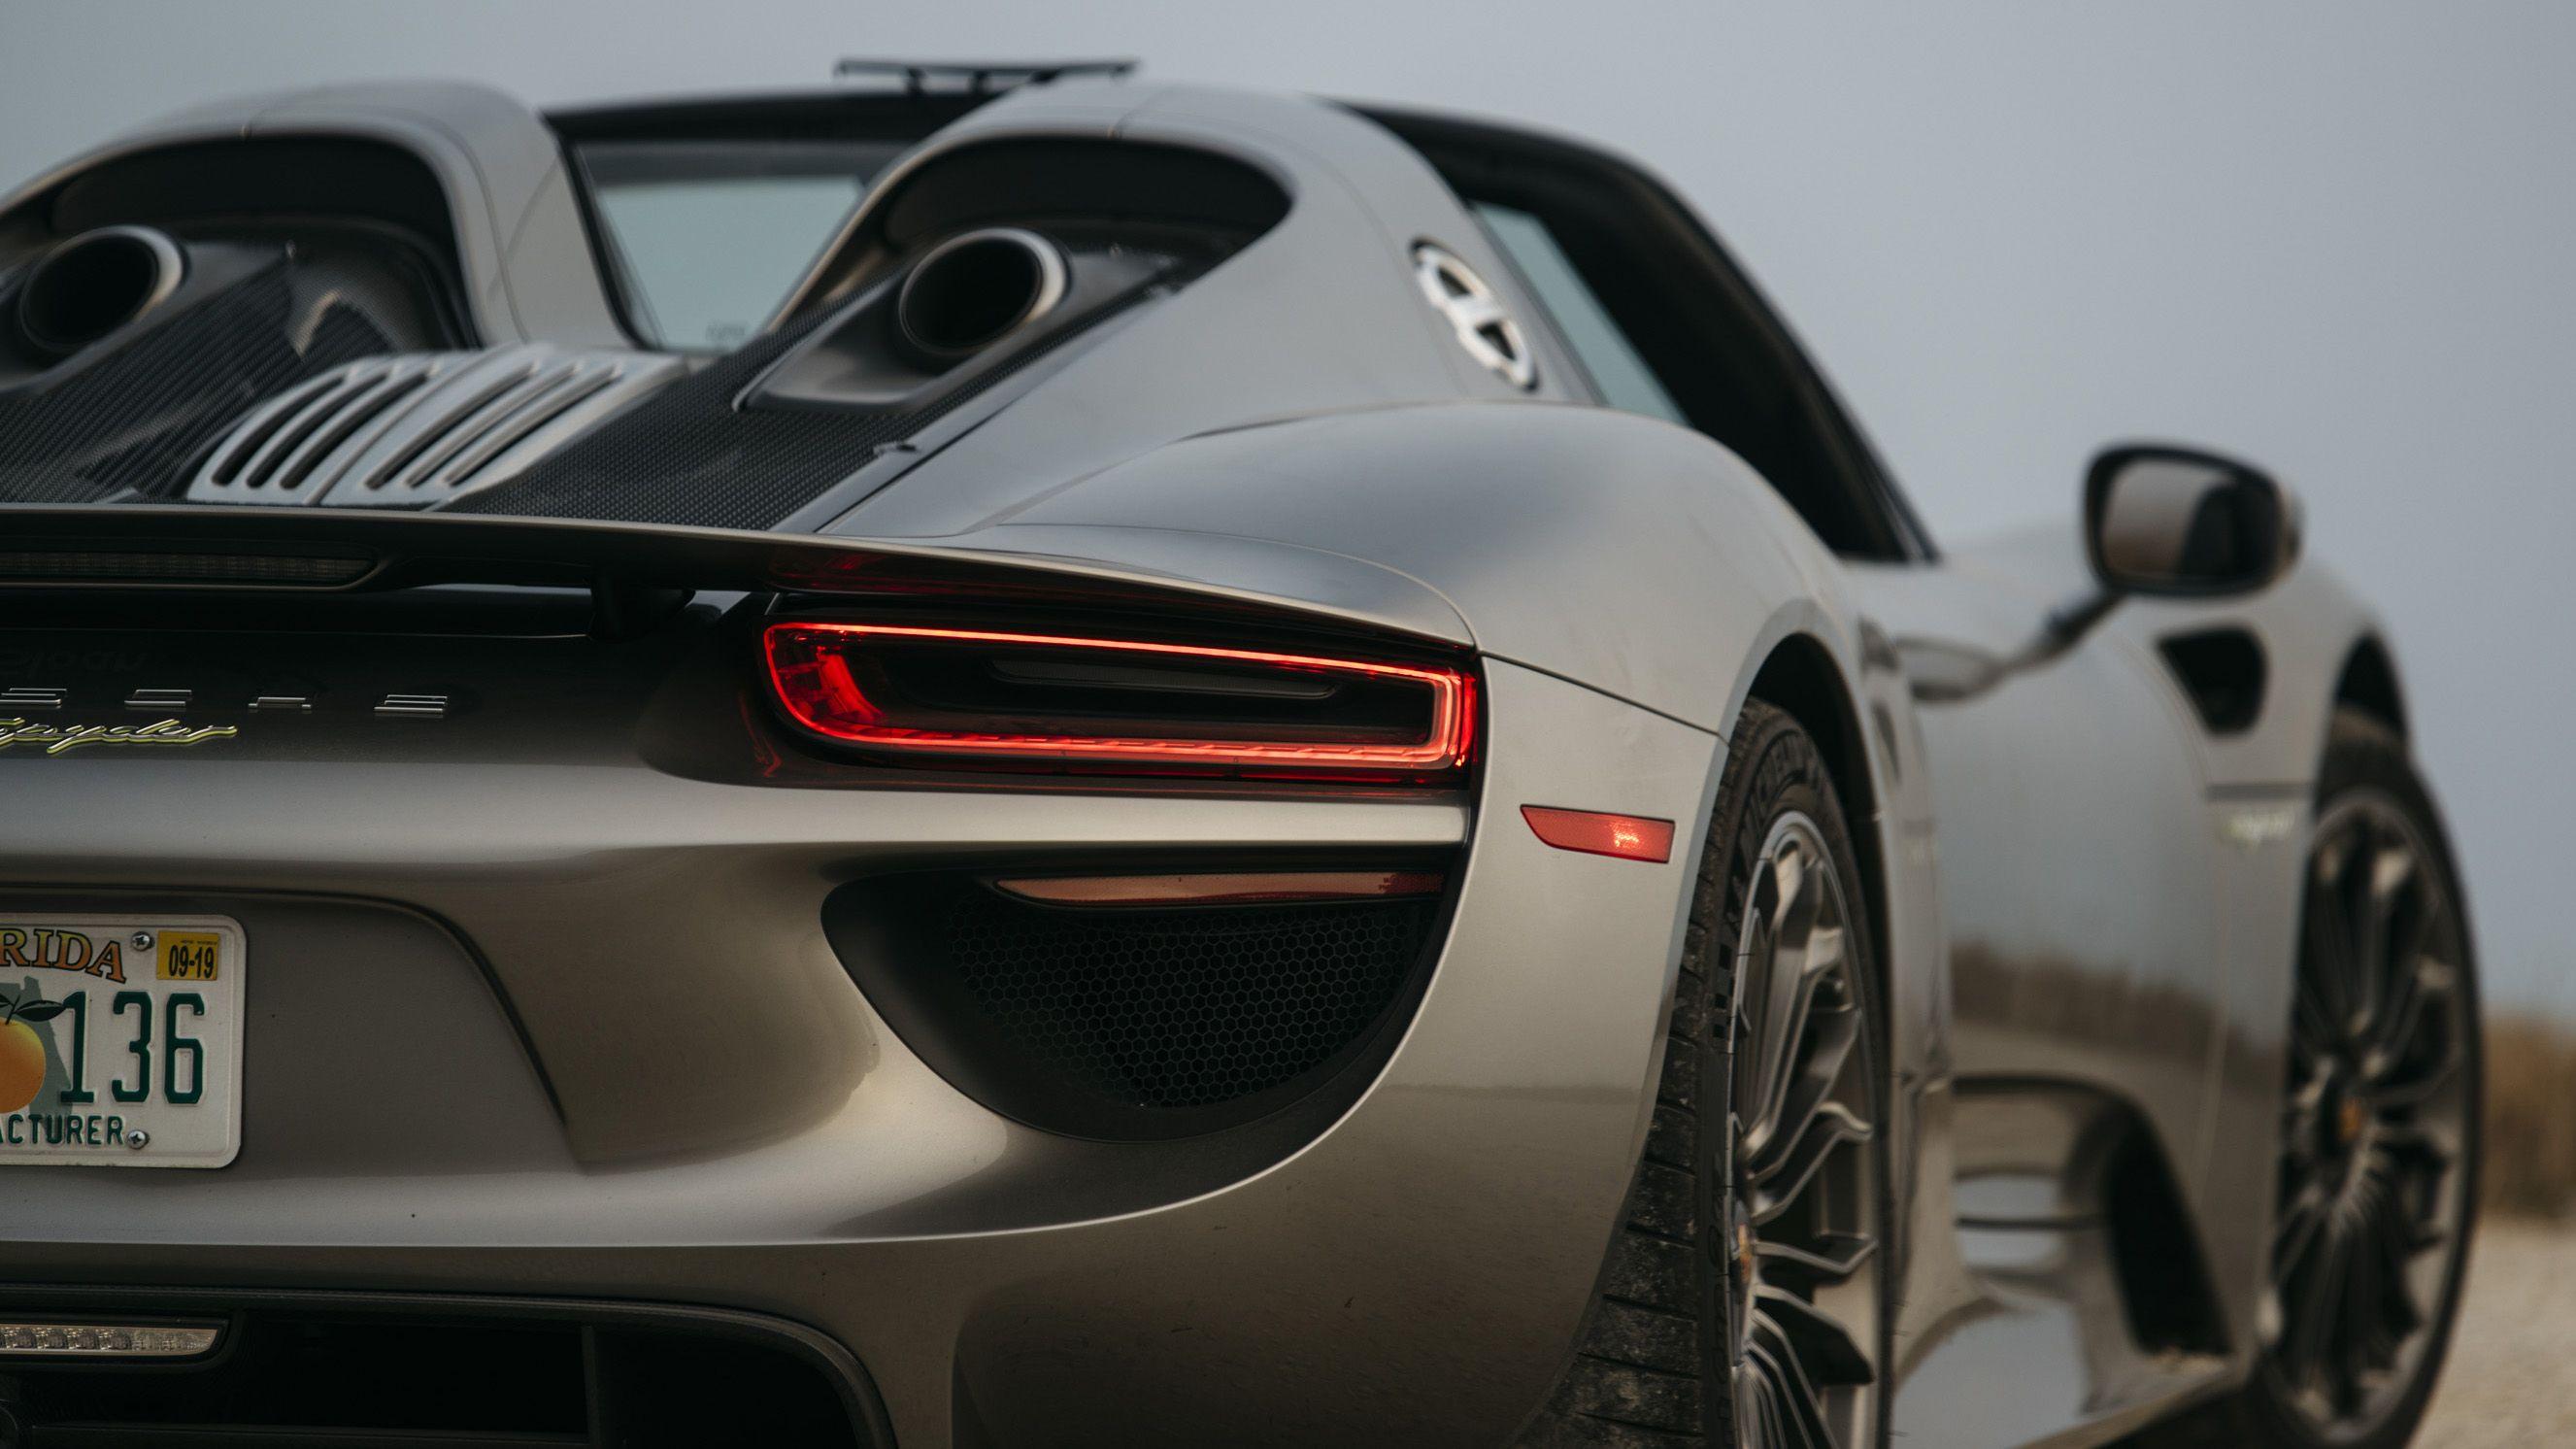 The 918 Spyder Transformed the Future of Porsche